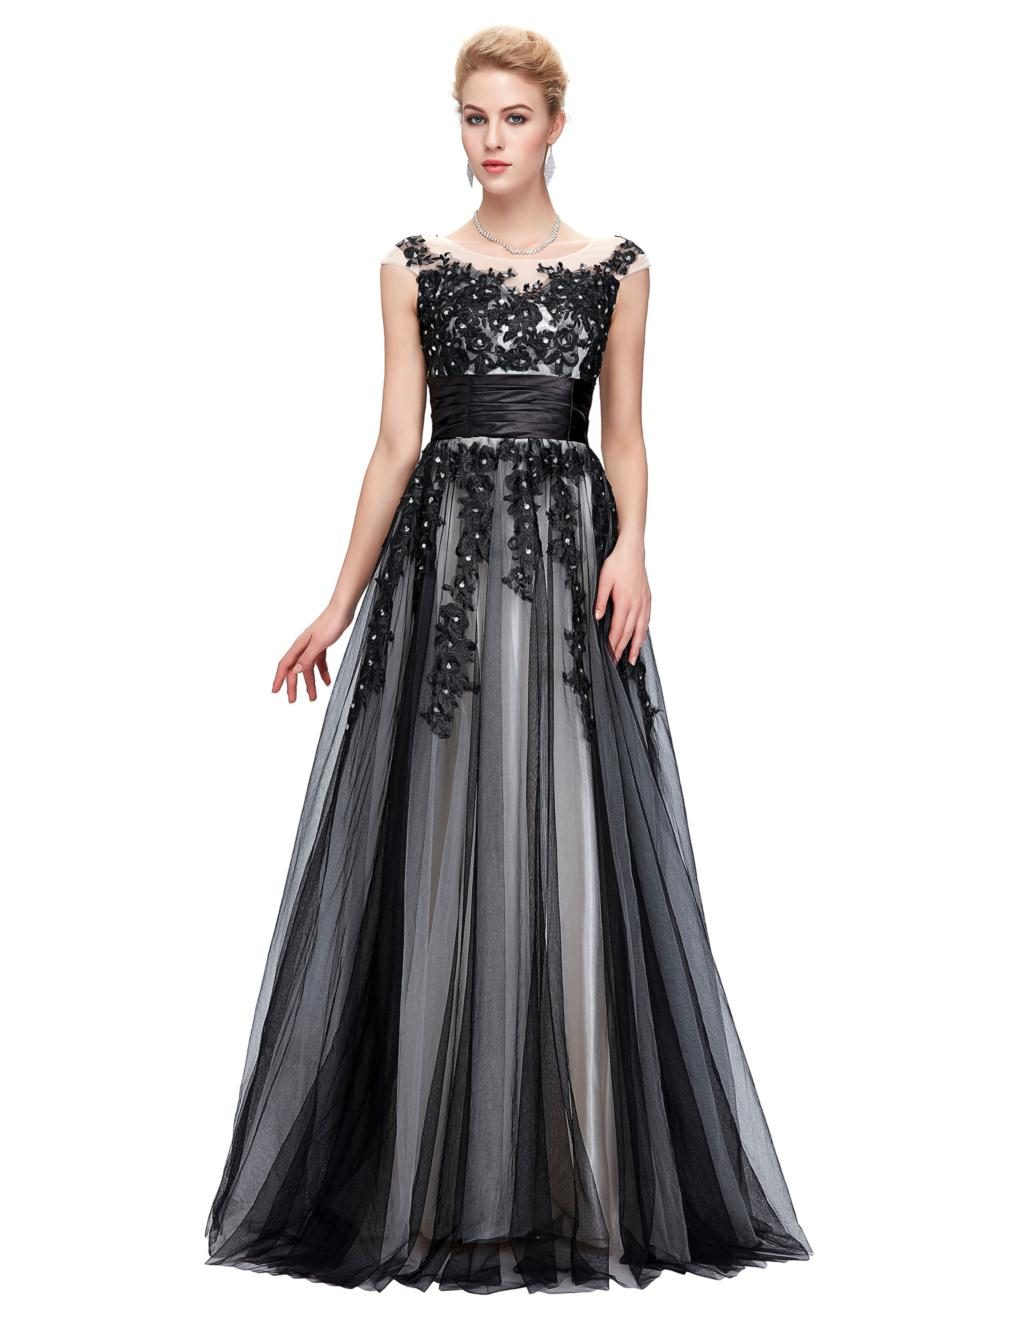 Elegant Lace Appliques Mother of the Bride Dress 5